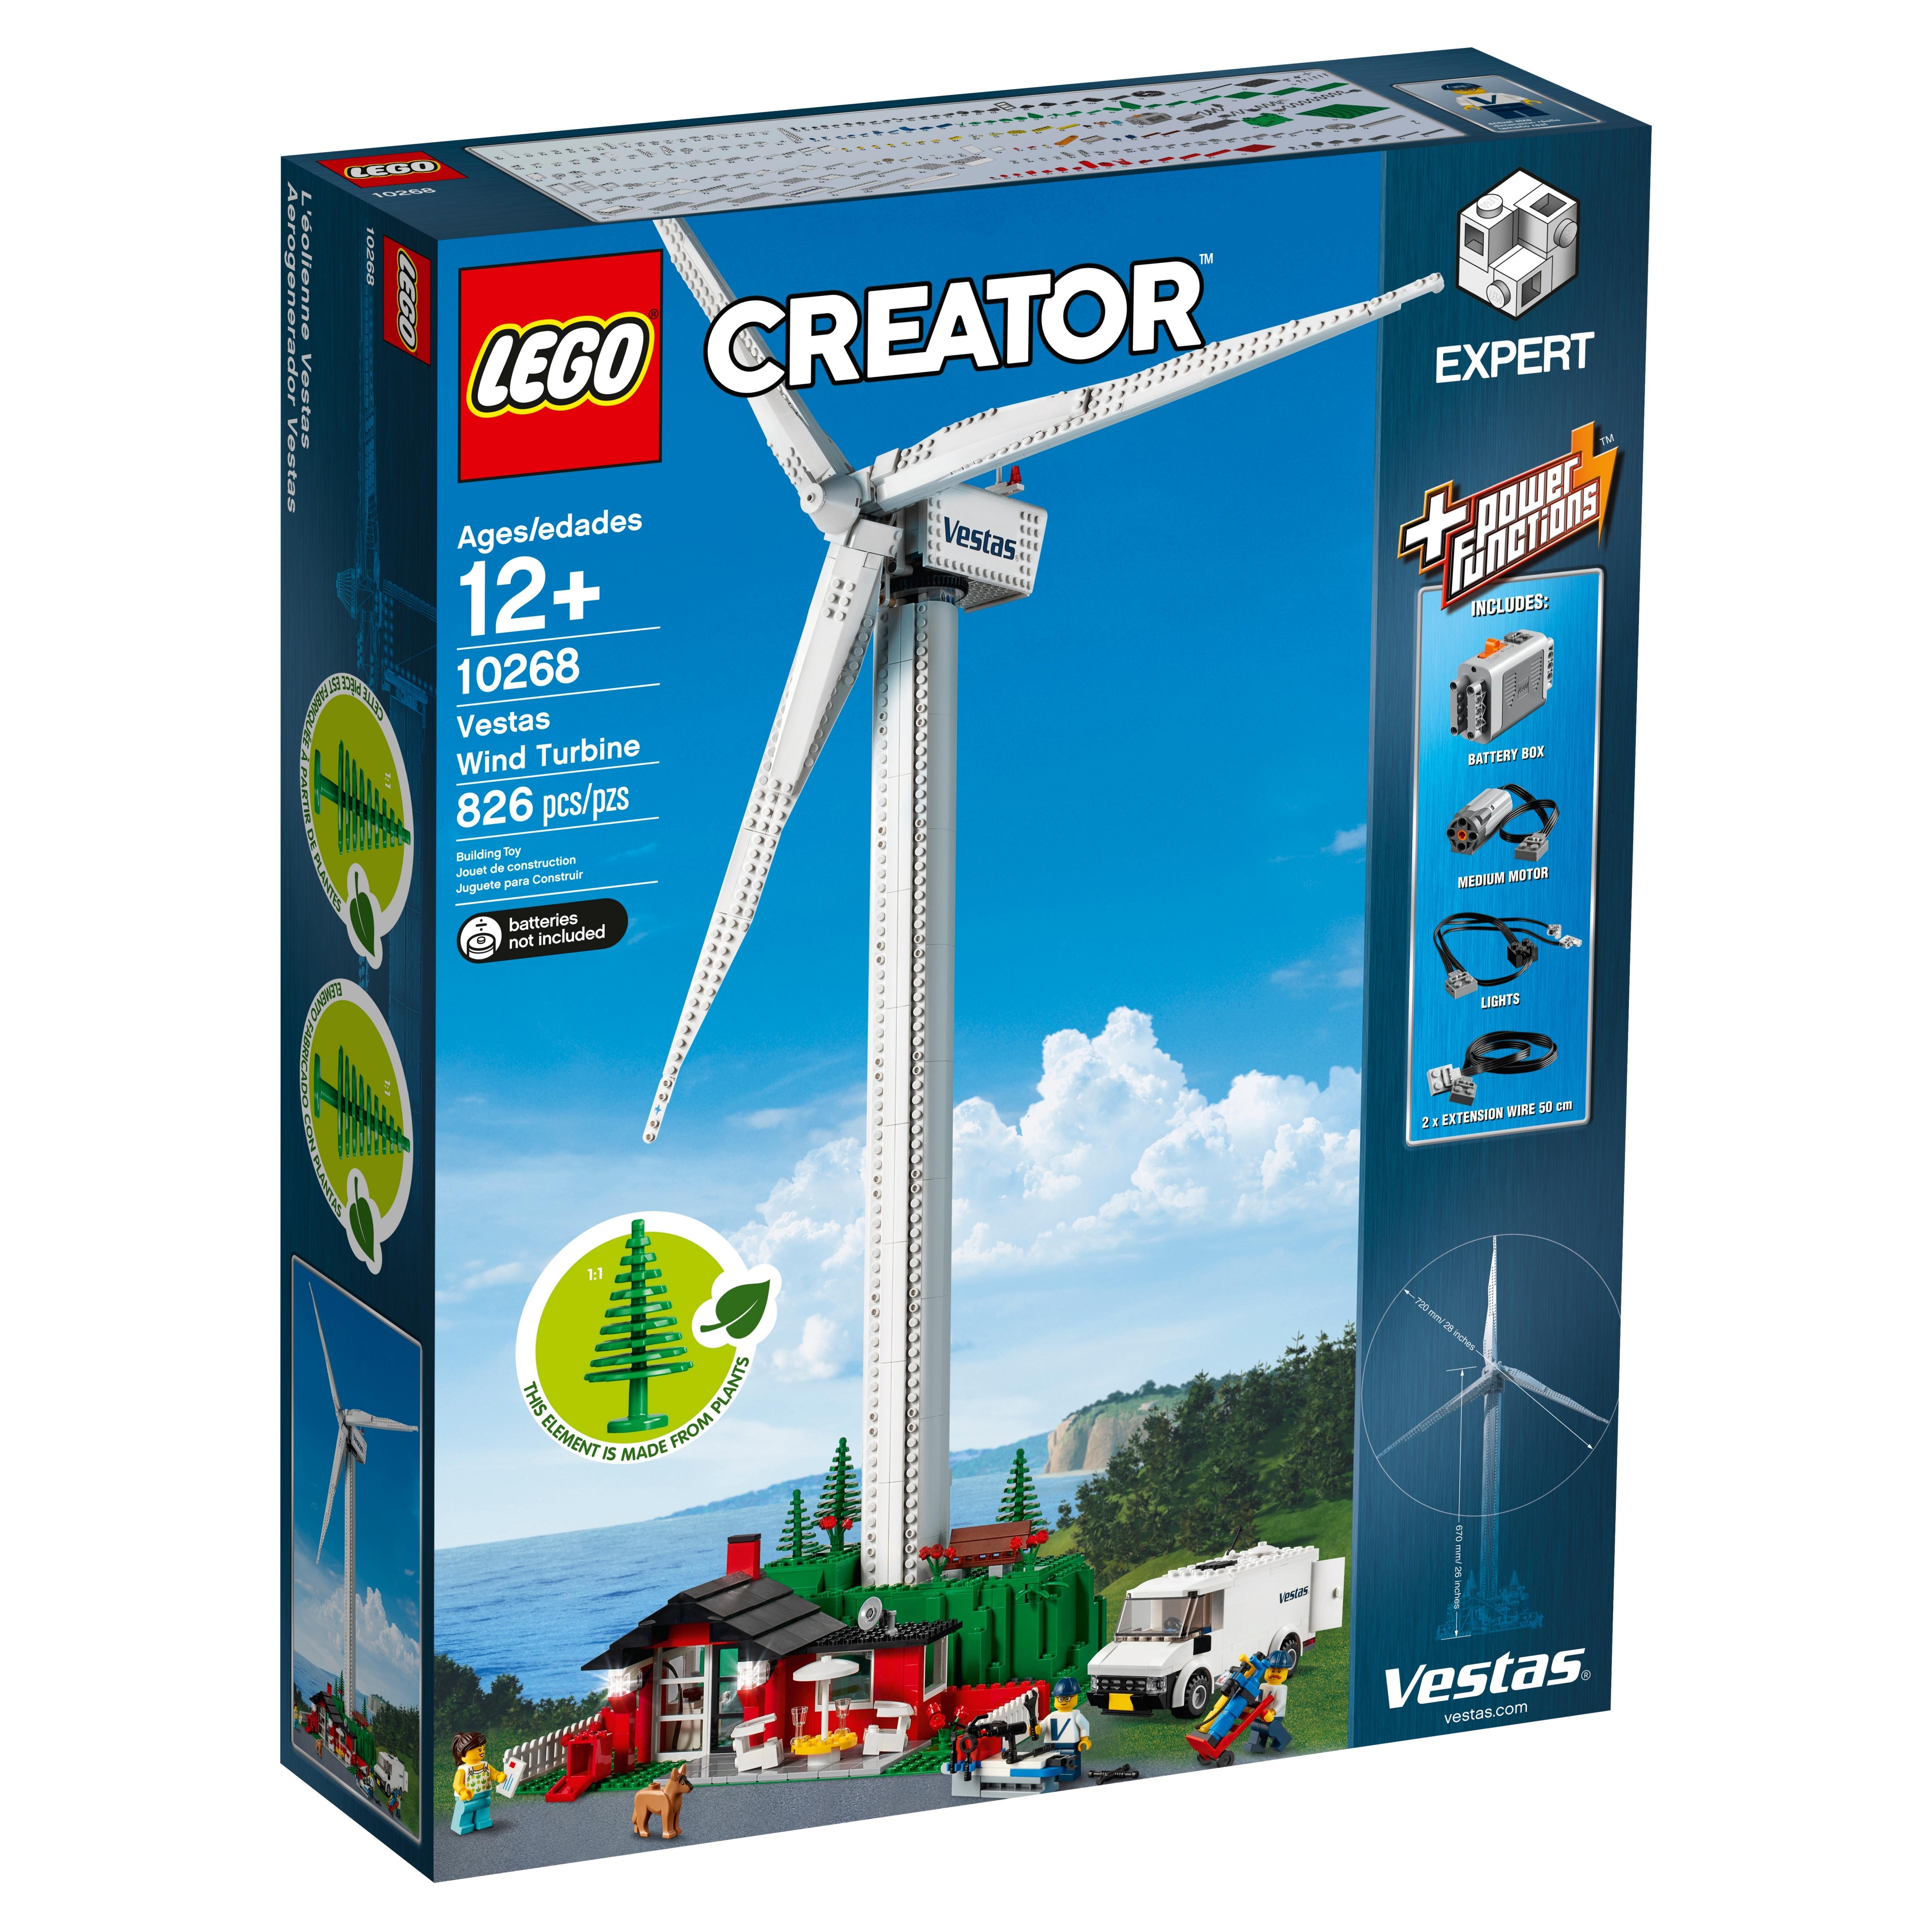 Lego Creator Vestas Wind Turbine 10268